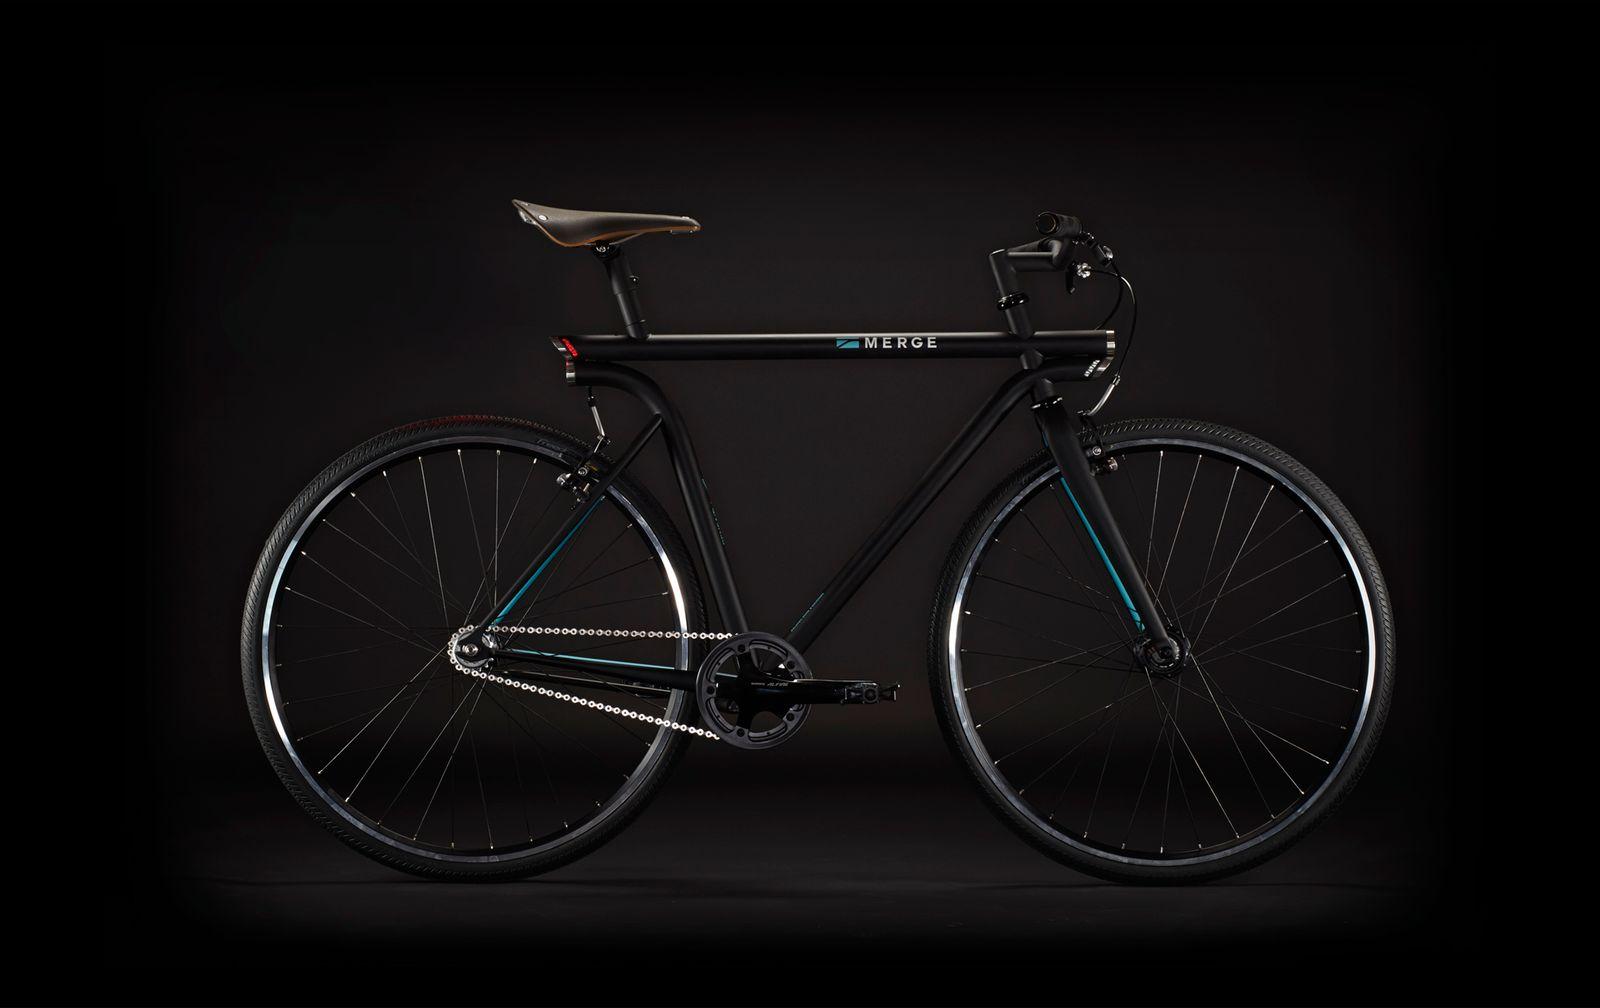 Merge New York City: Pensa x Horse Cycles